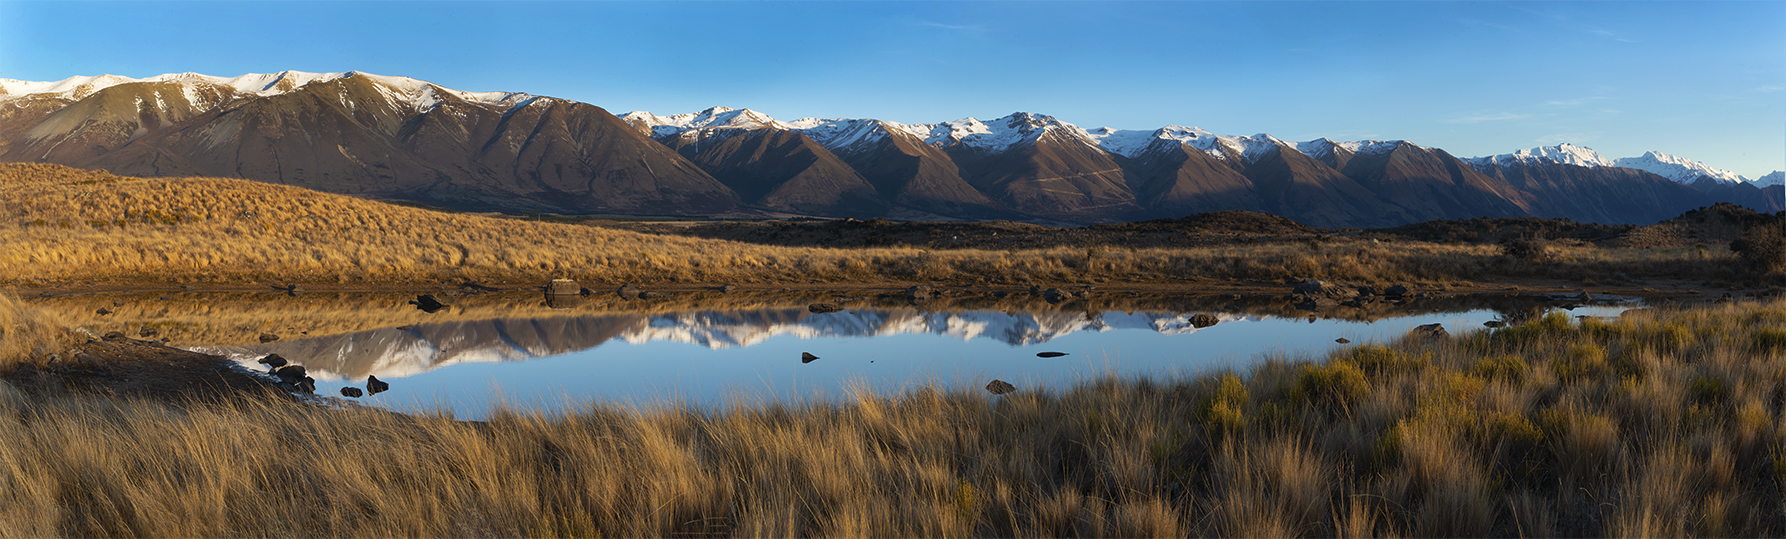 Near Lake Ohau, New Zealand. A Limited Edition Fine Art Landscape Photograph by Richard Hume